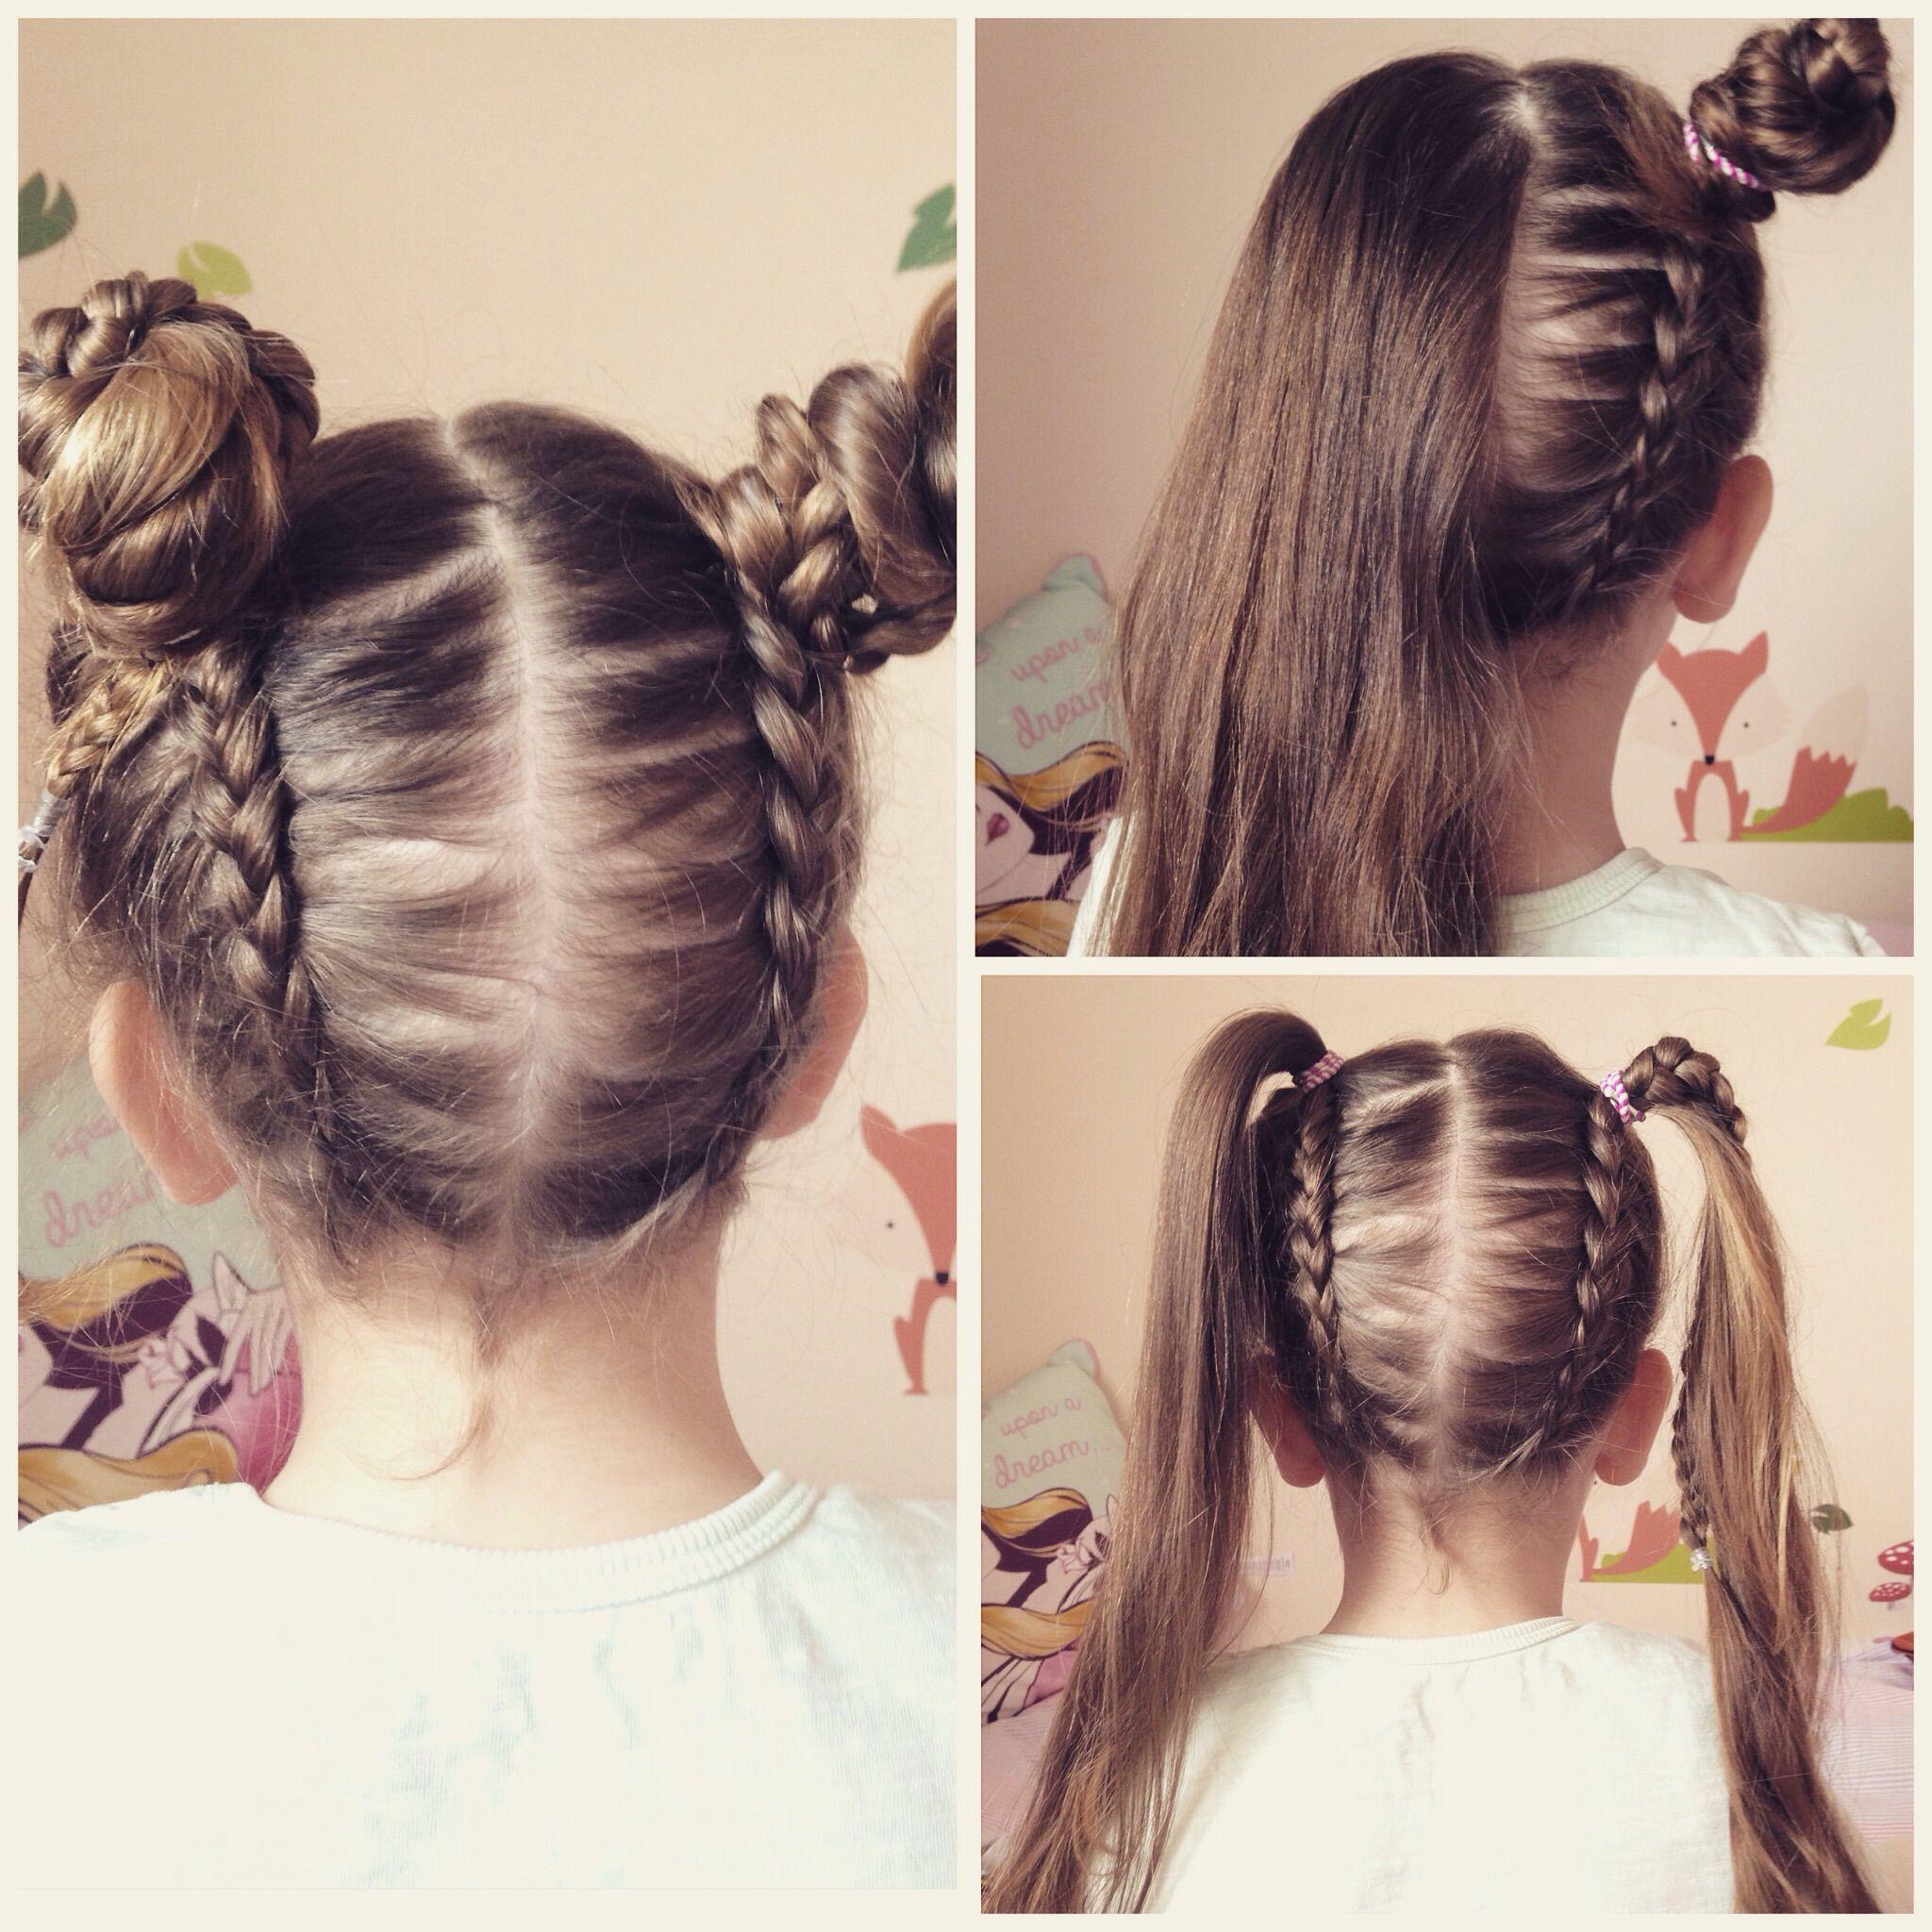 Upside down dutch braid into messy bun pigtails. Little